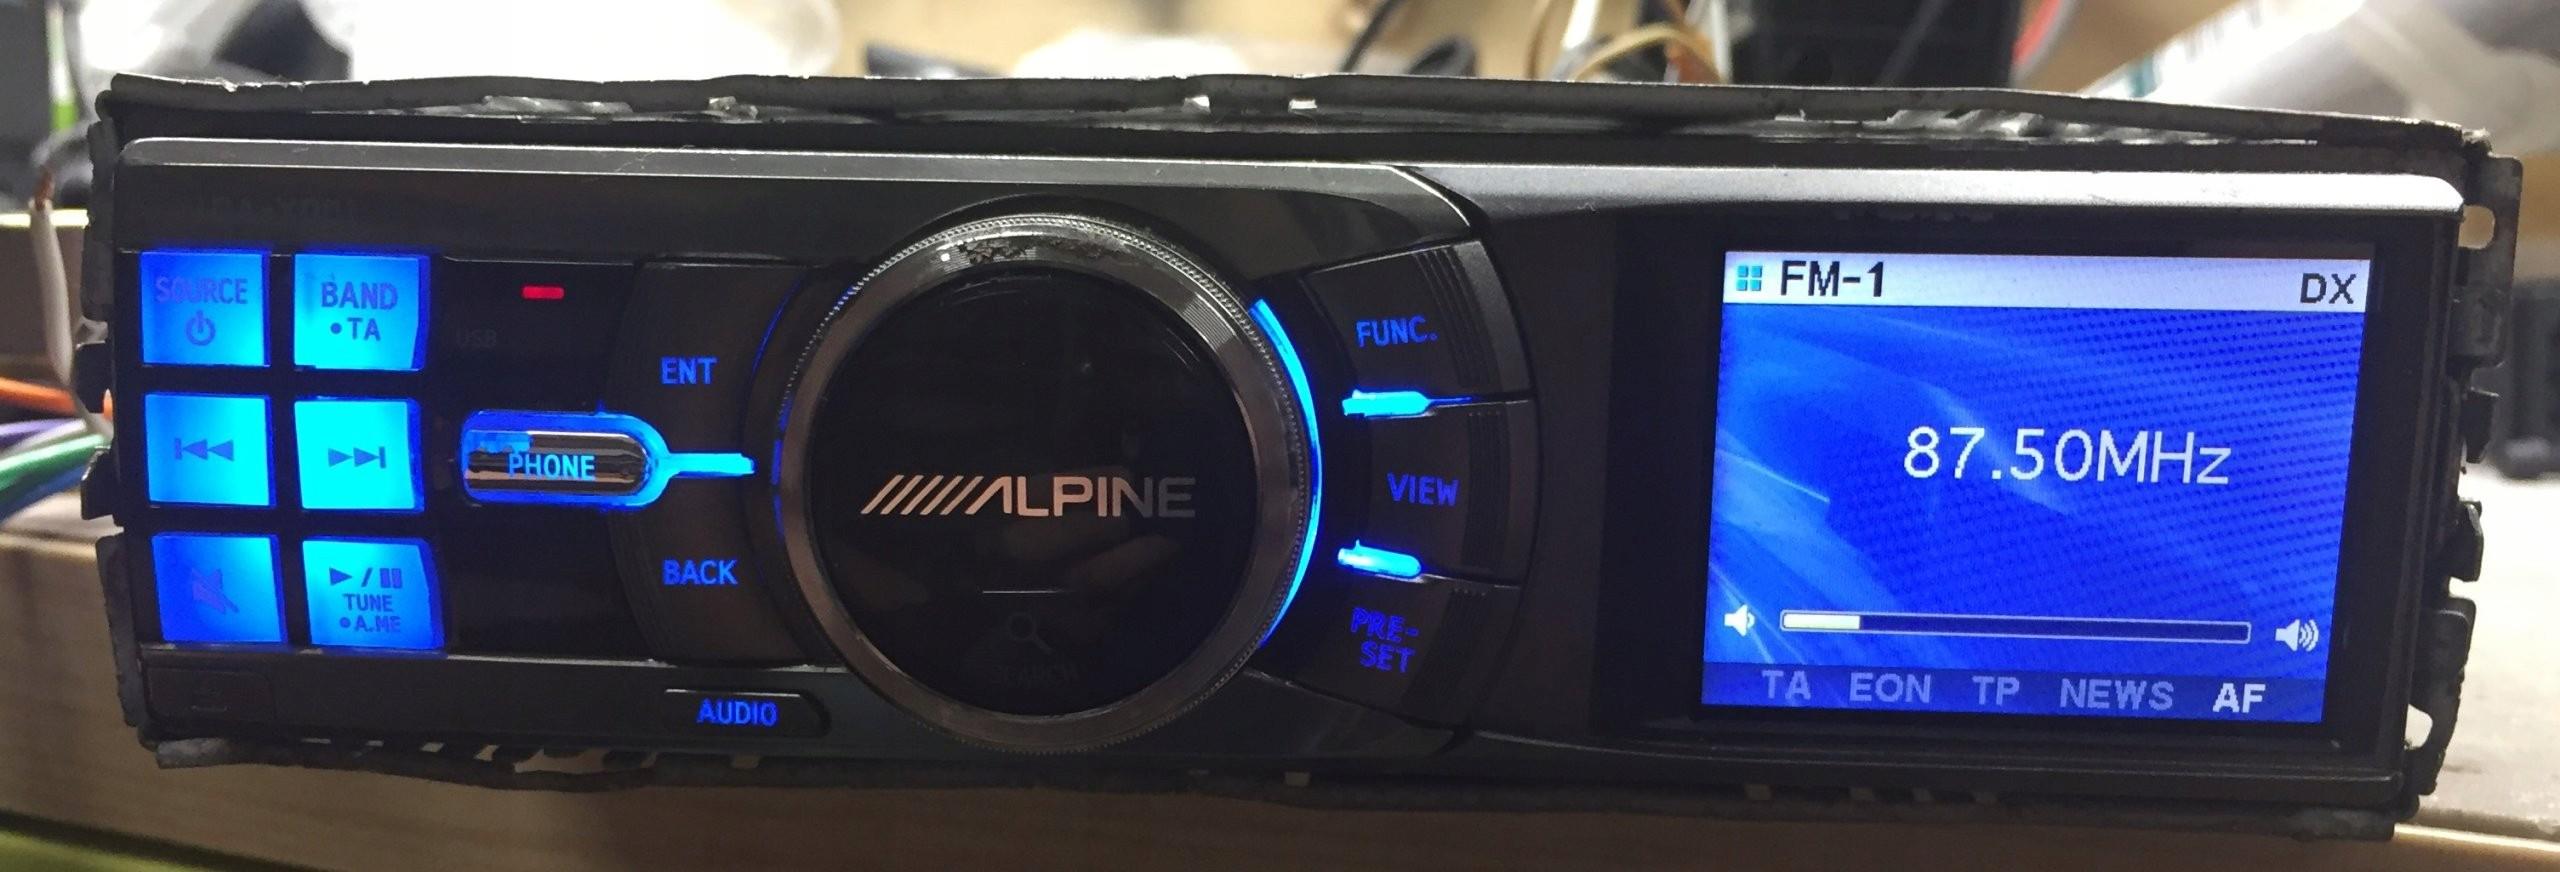 lage prijs verkoop nieuwe lagere prijzen outlet boetiek Samochodowe radio Alpine iDA-X001 ! - 7404986231 - oficjalne ...